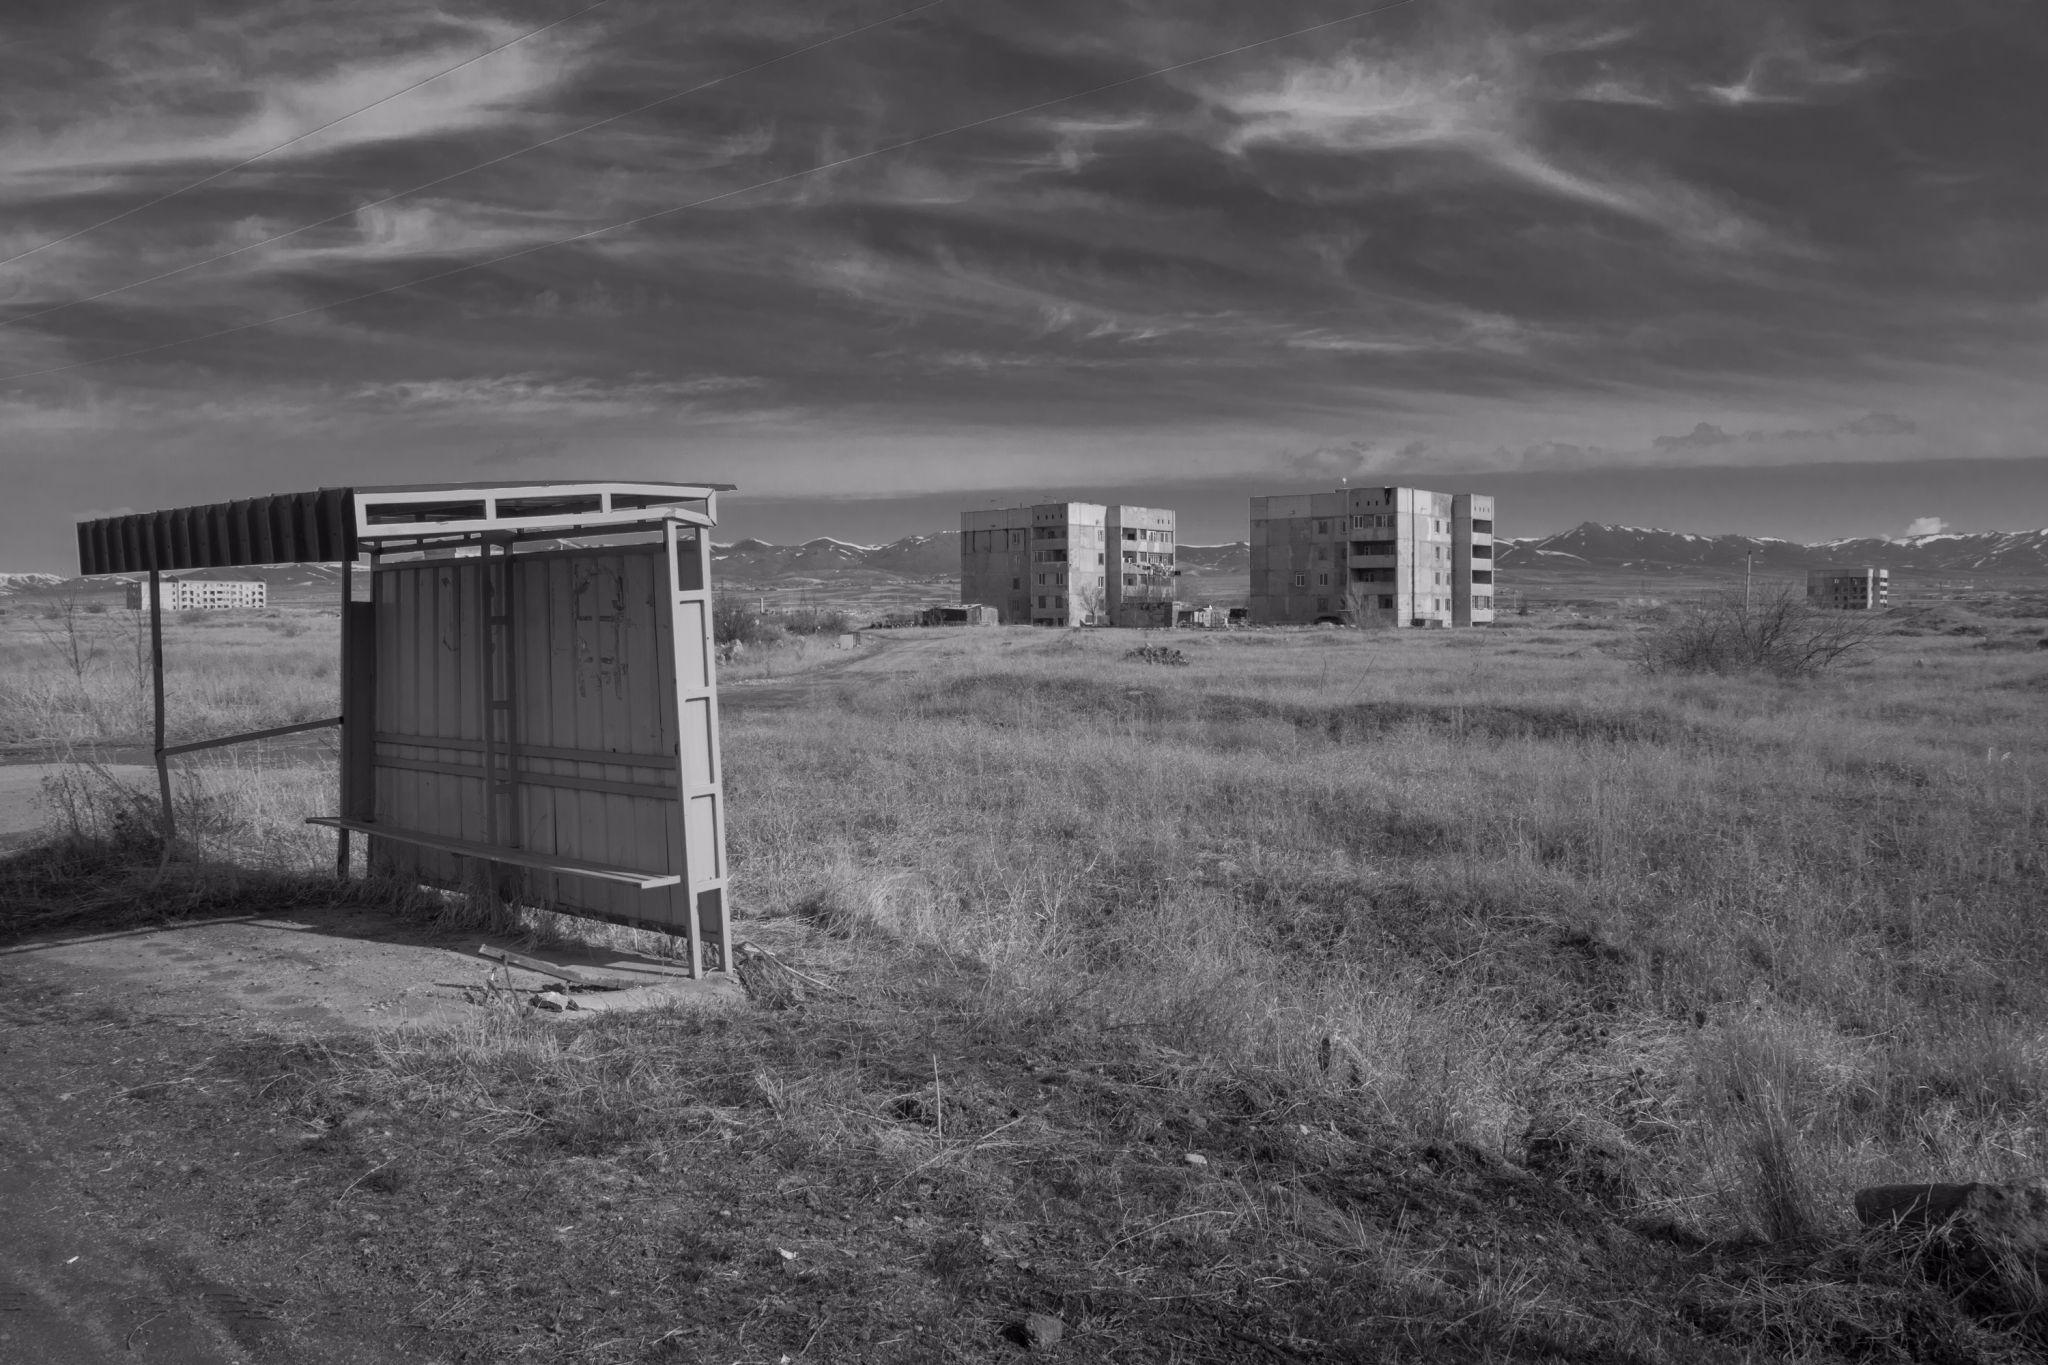 Bus stop Marmashen Highway, Armenia